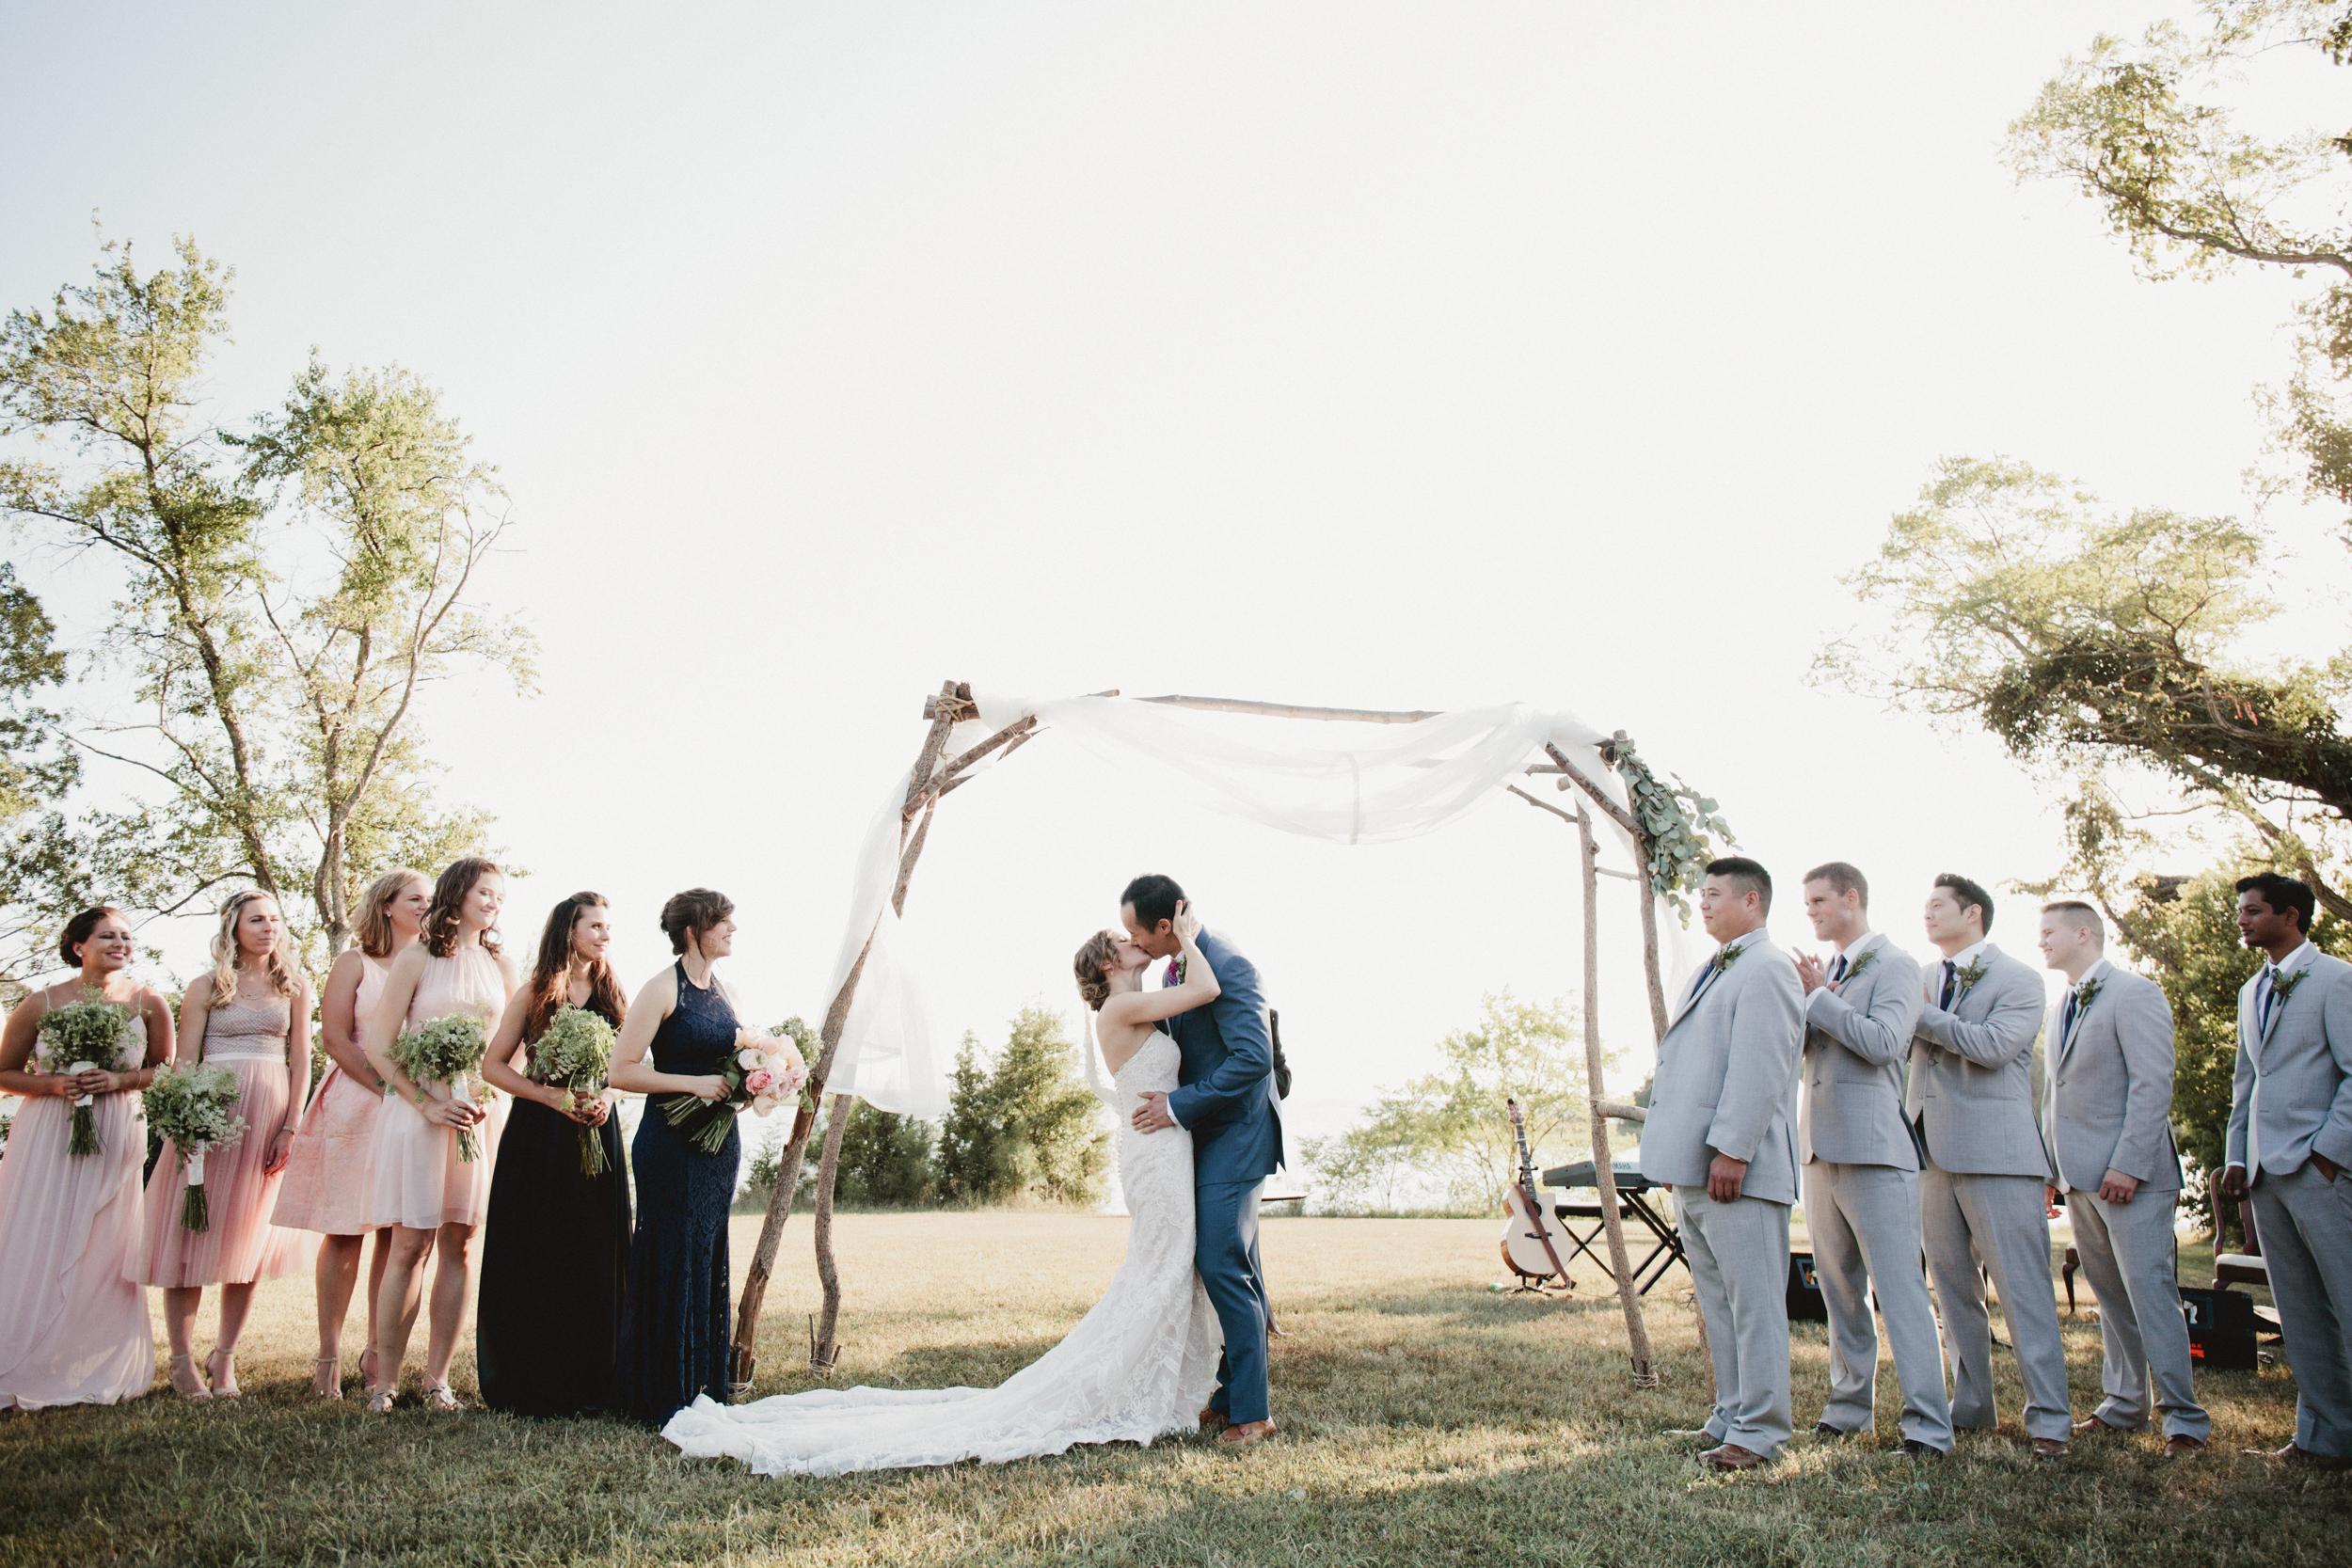 Maine-Wedding-Photographer-1043.jpg